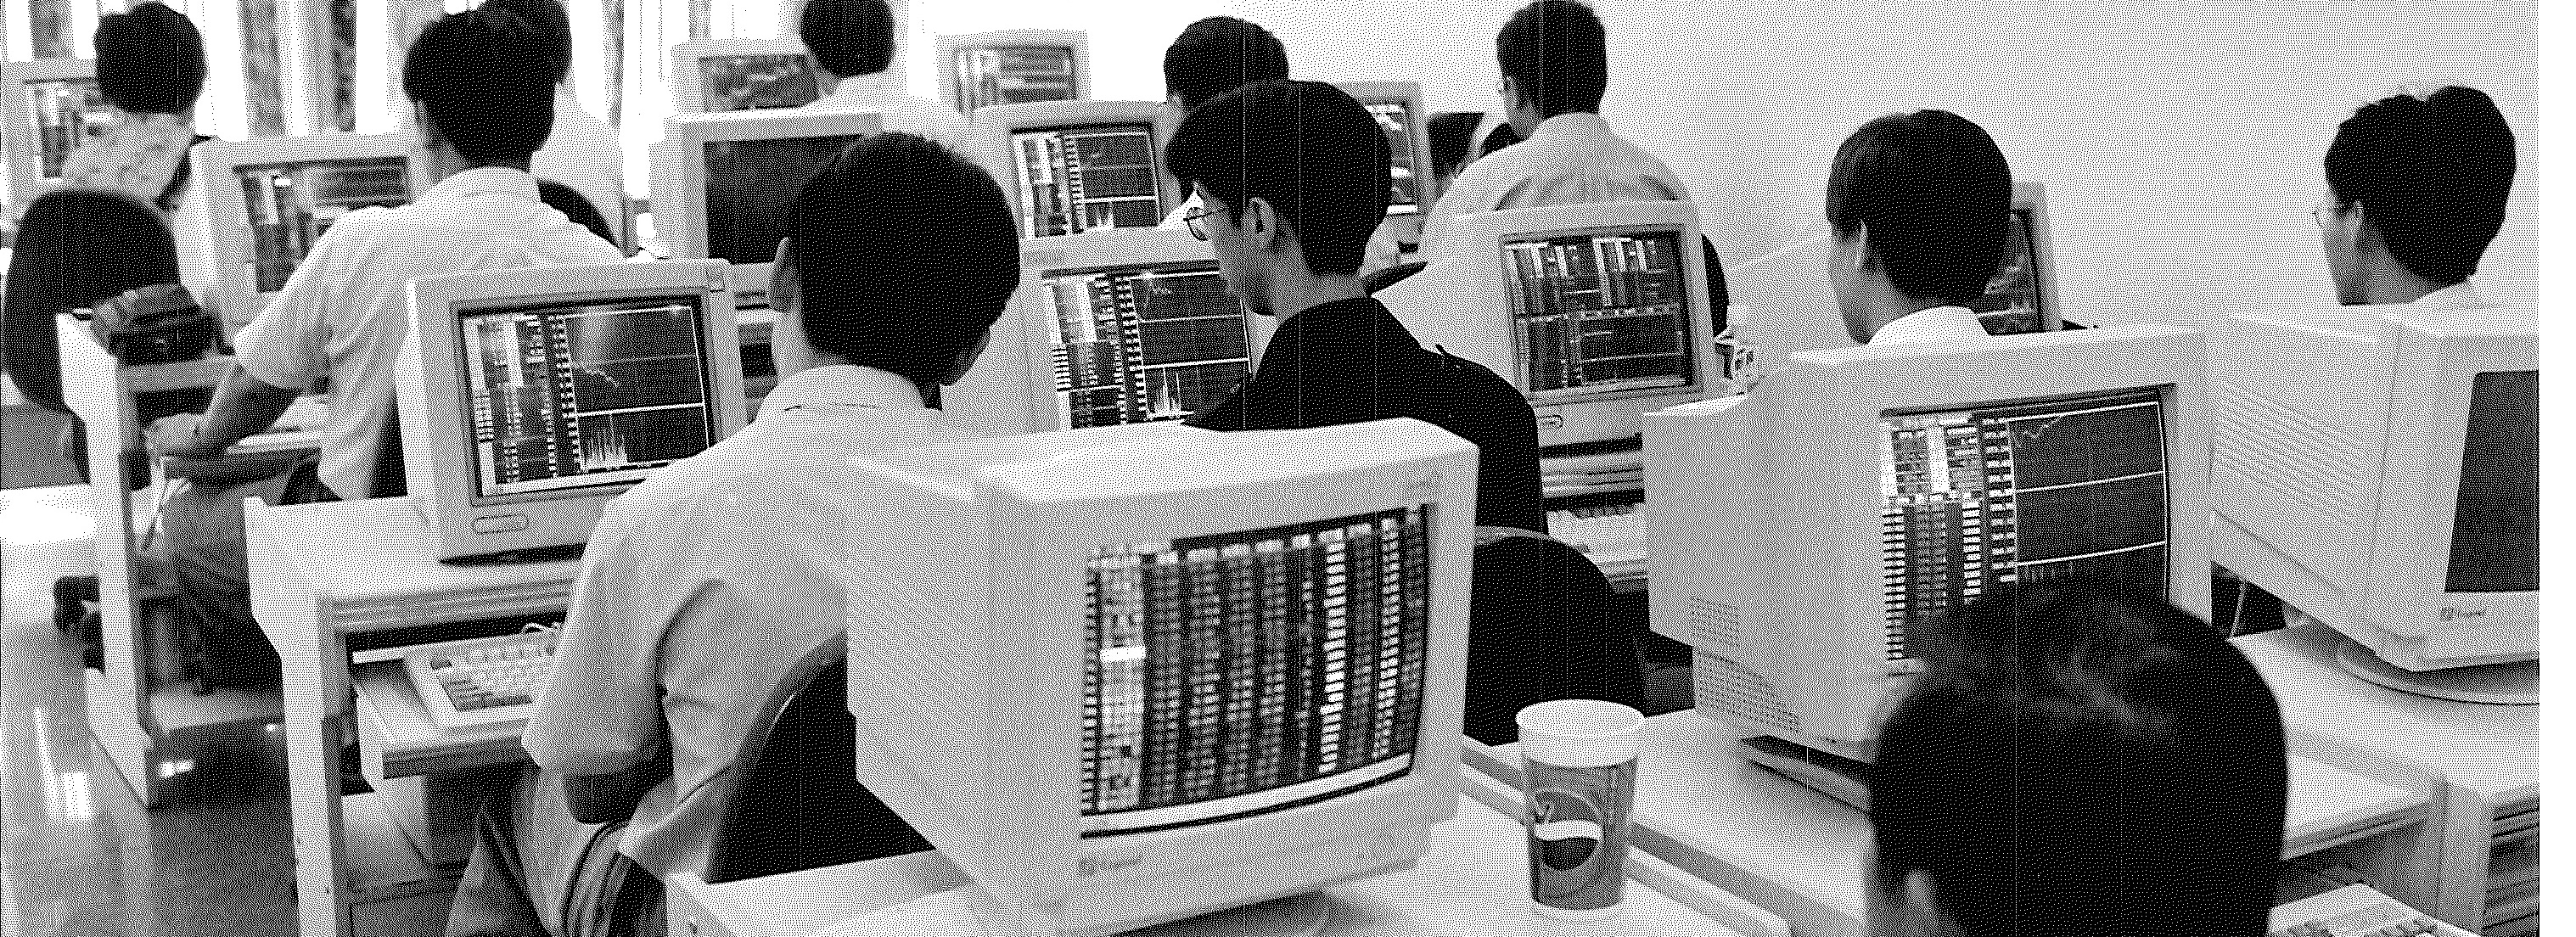 15. Public Stock Exchange, Shenzen, China, 1998 Screenwide